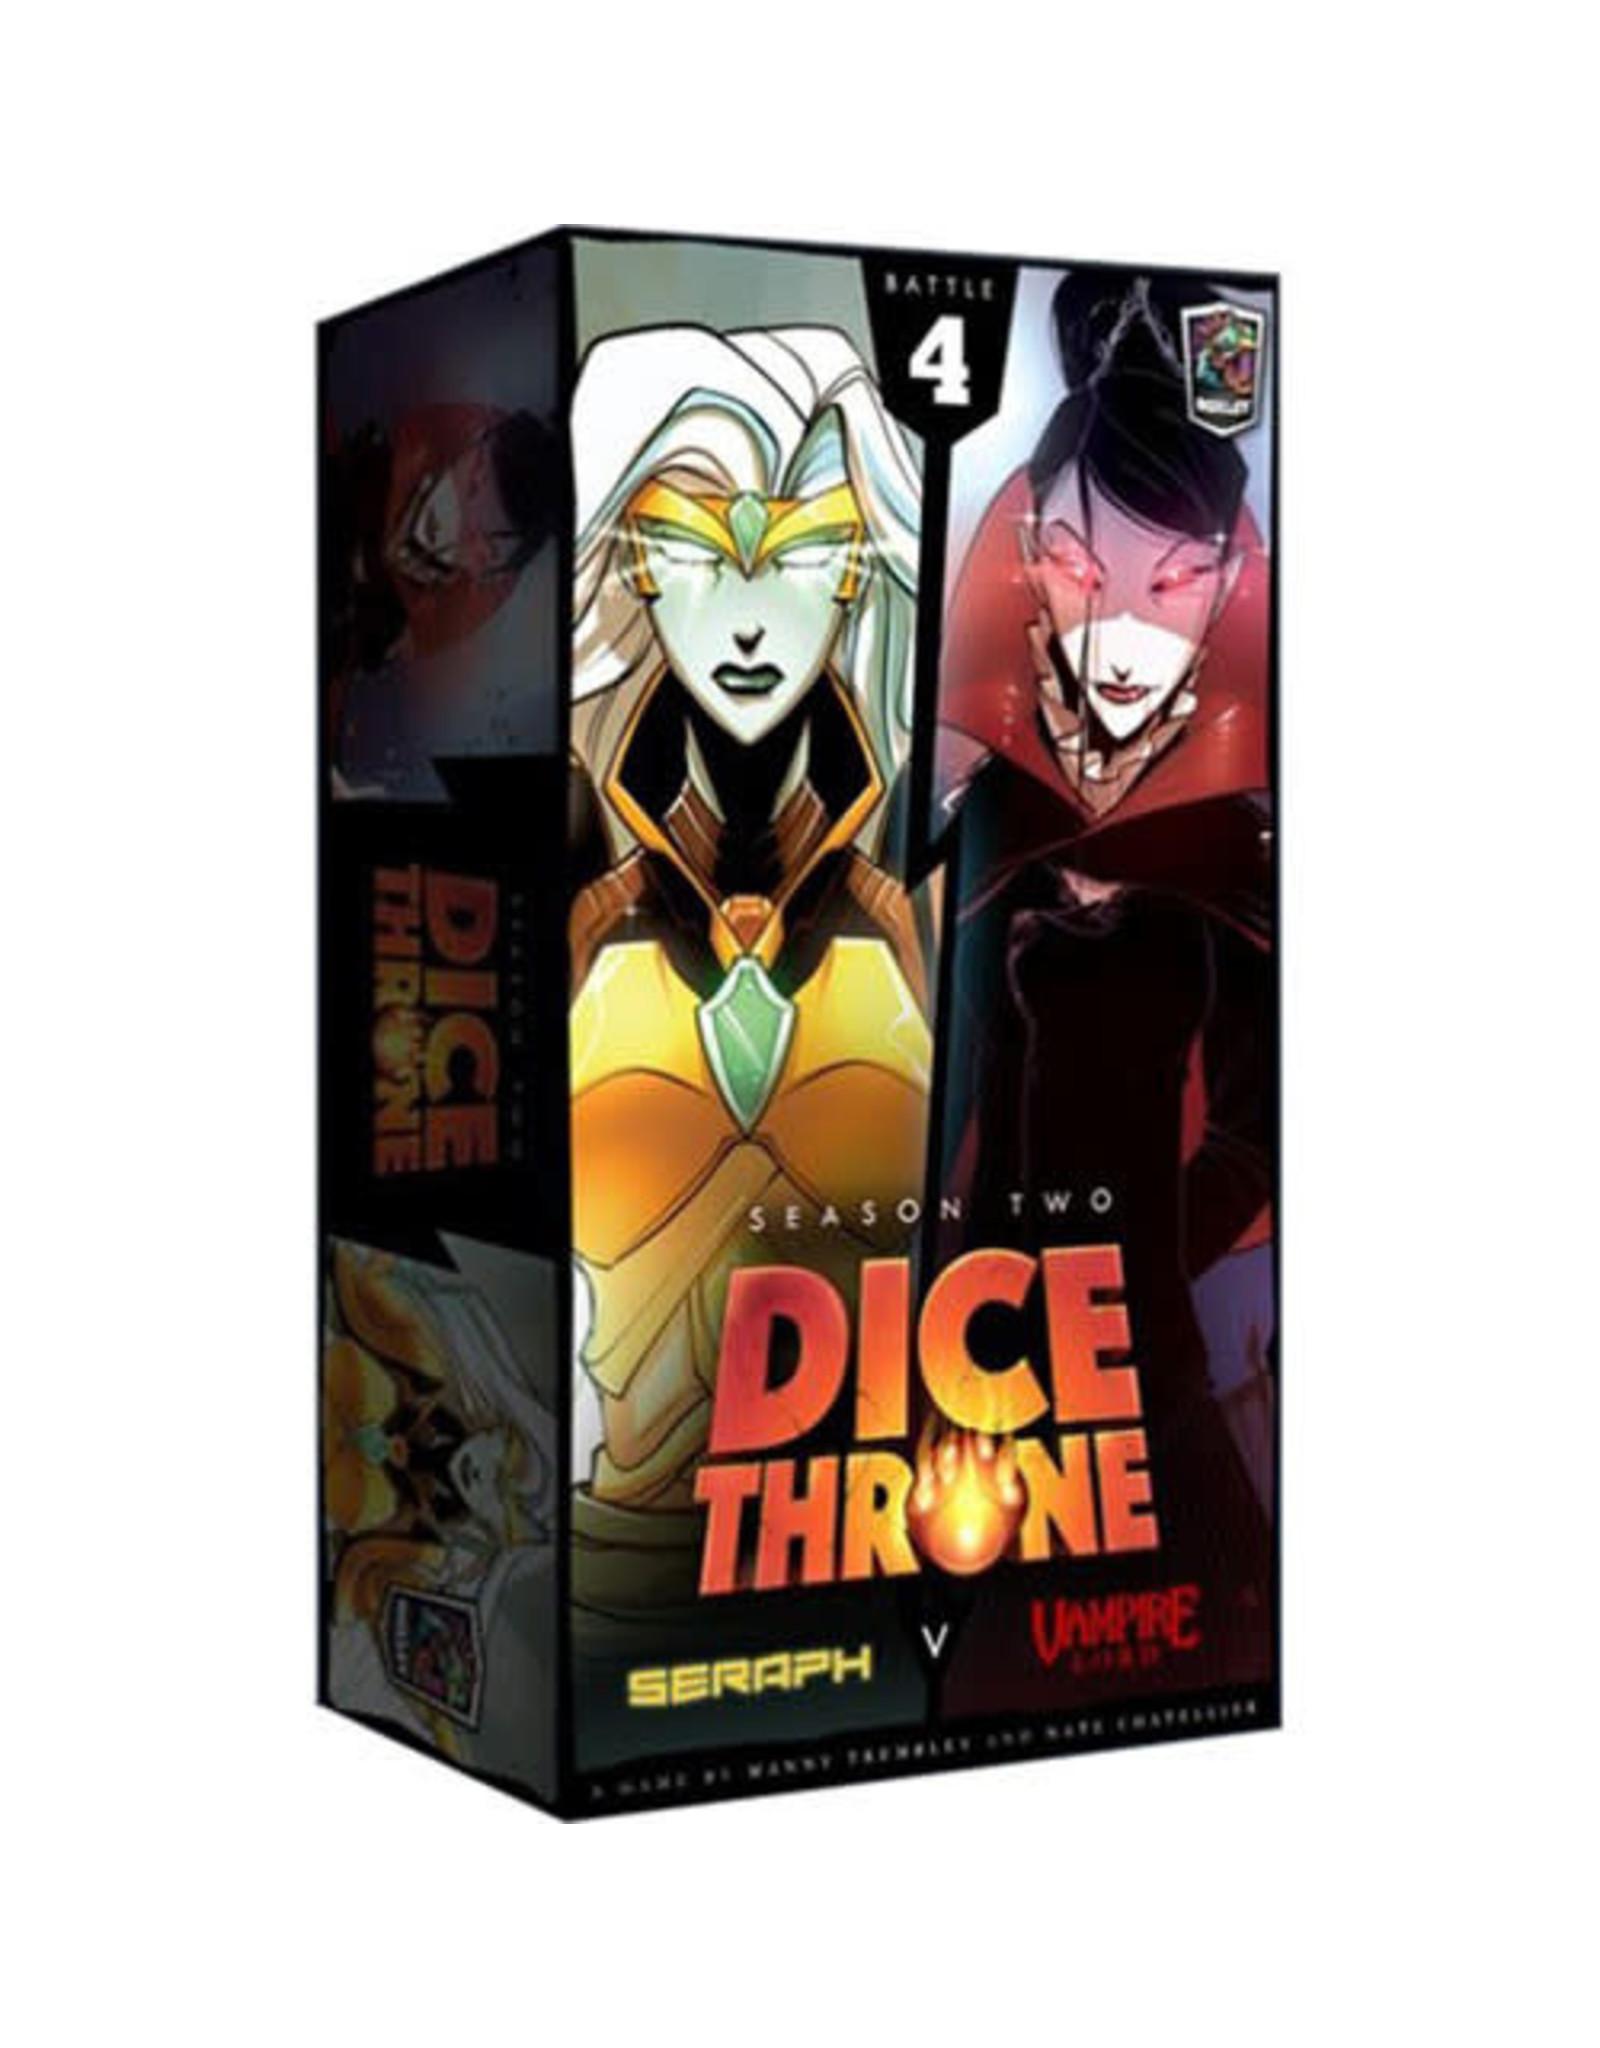 Roxley Dice Throne: Season 2 Battle 4 Seraph vs. Vampire Lord